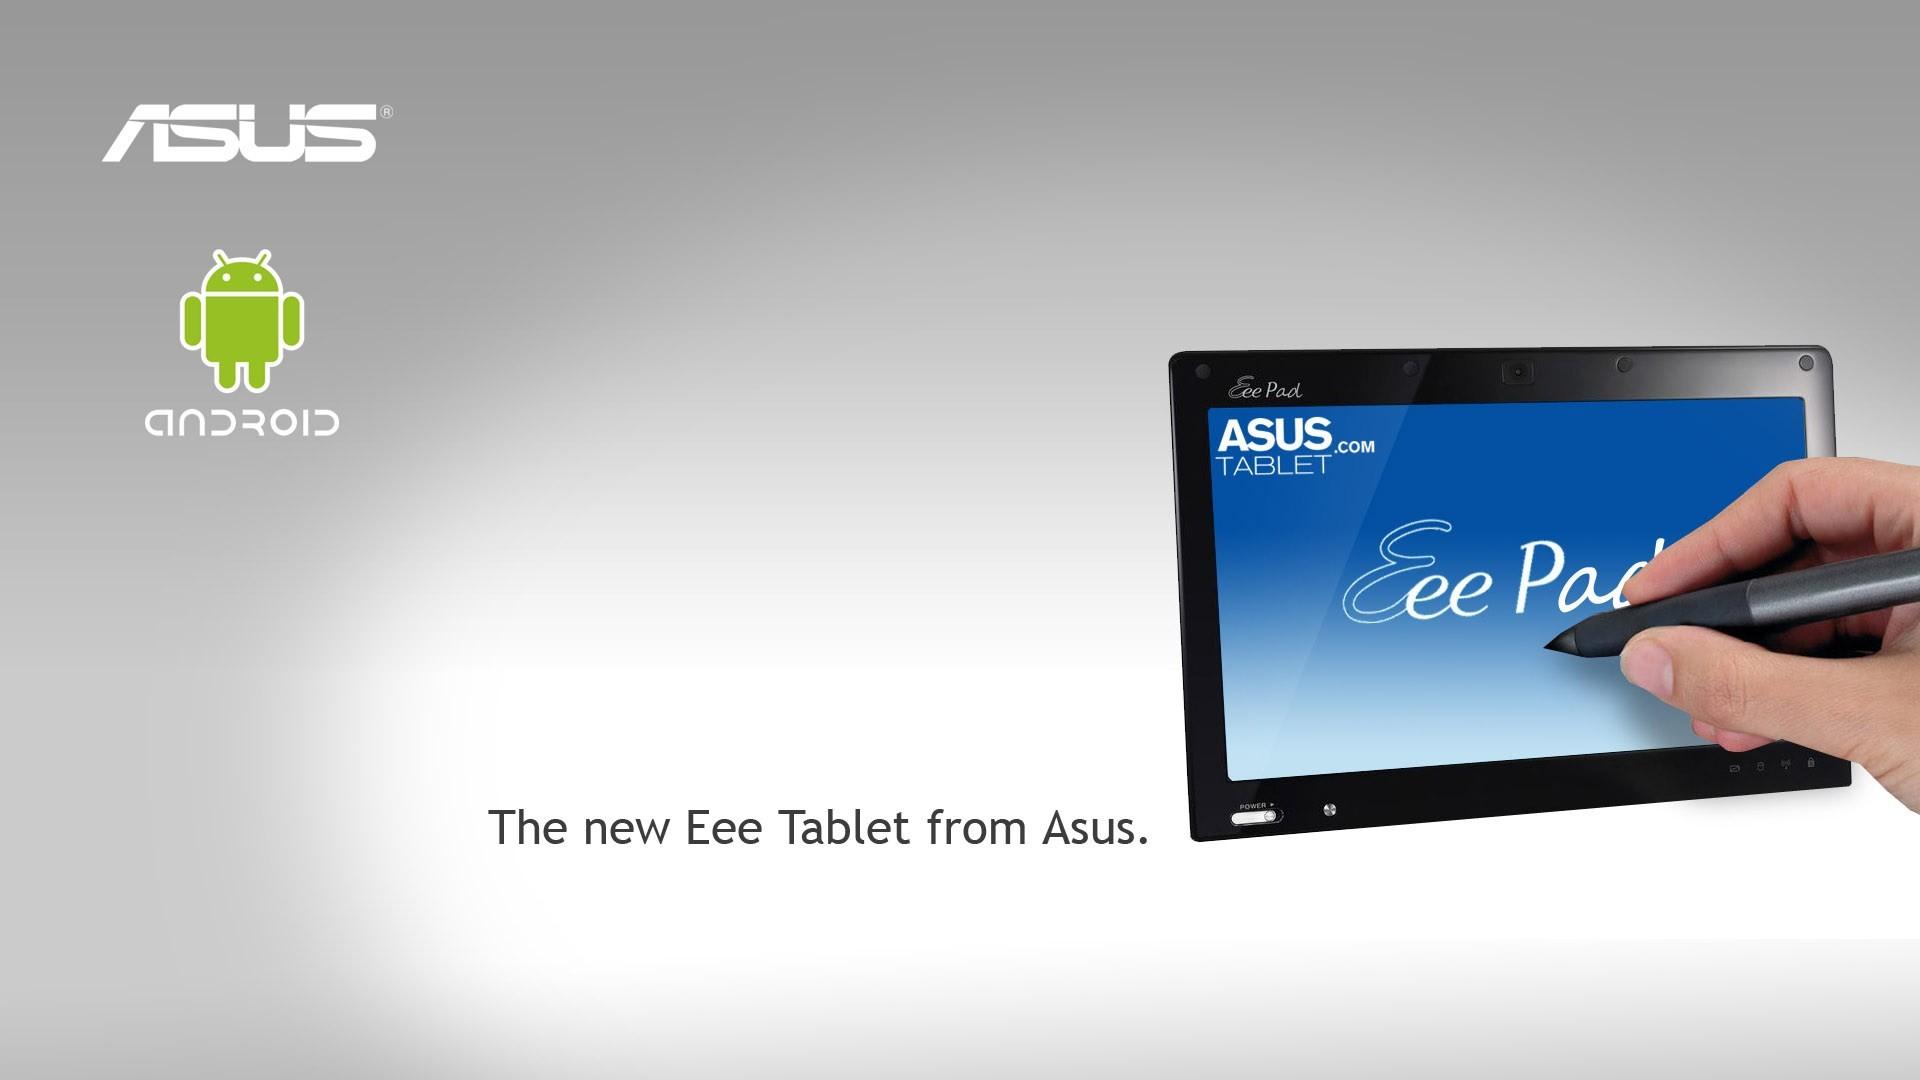 4K Ultra HD Images Collection of Asus Tablet: Fergal Fleisch